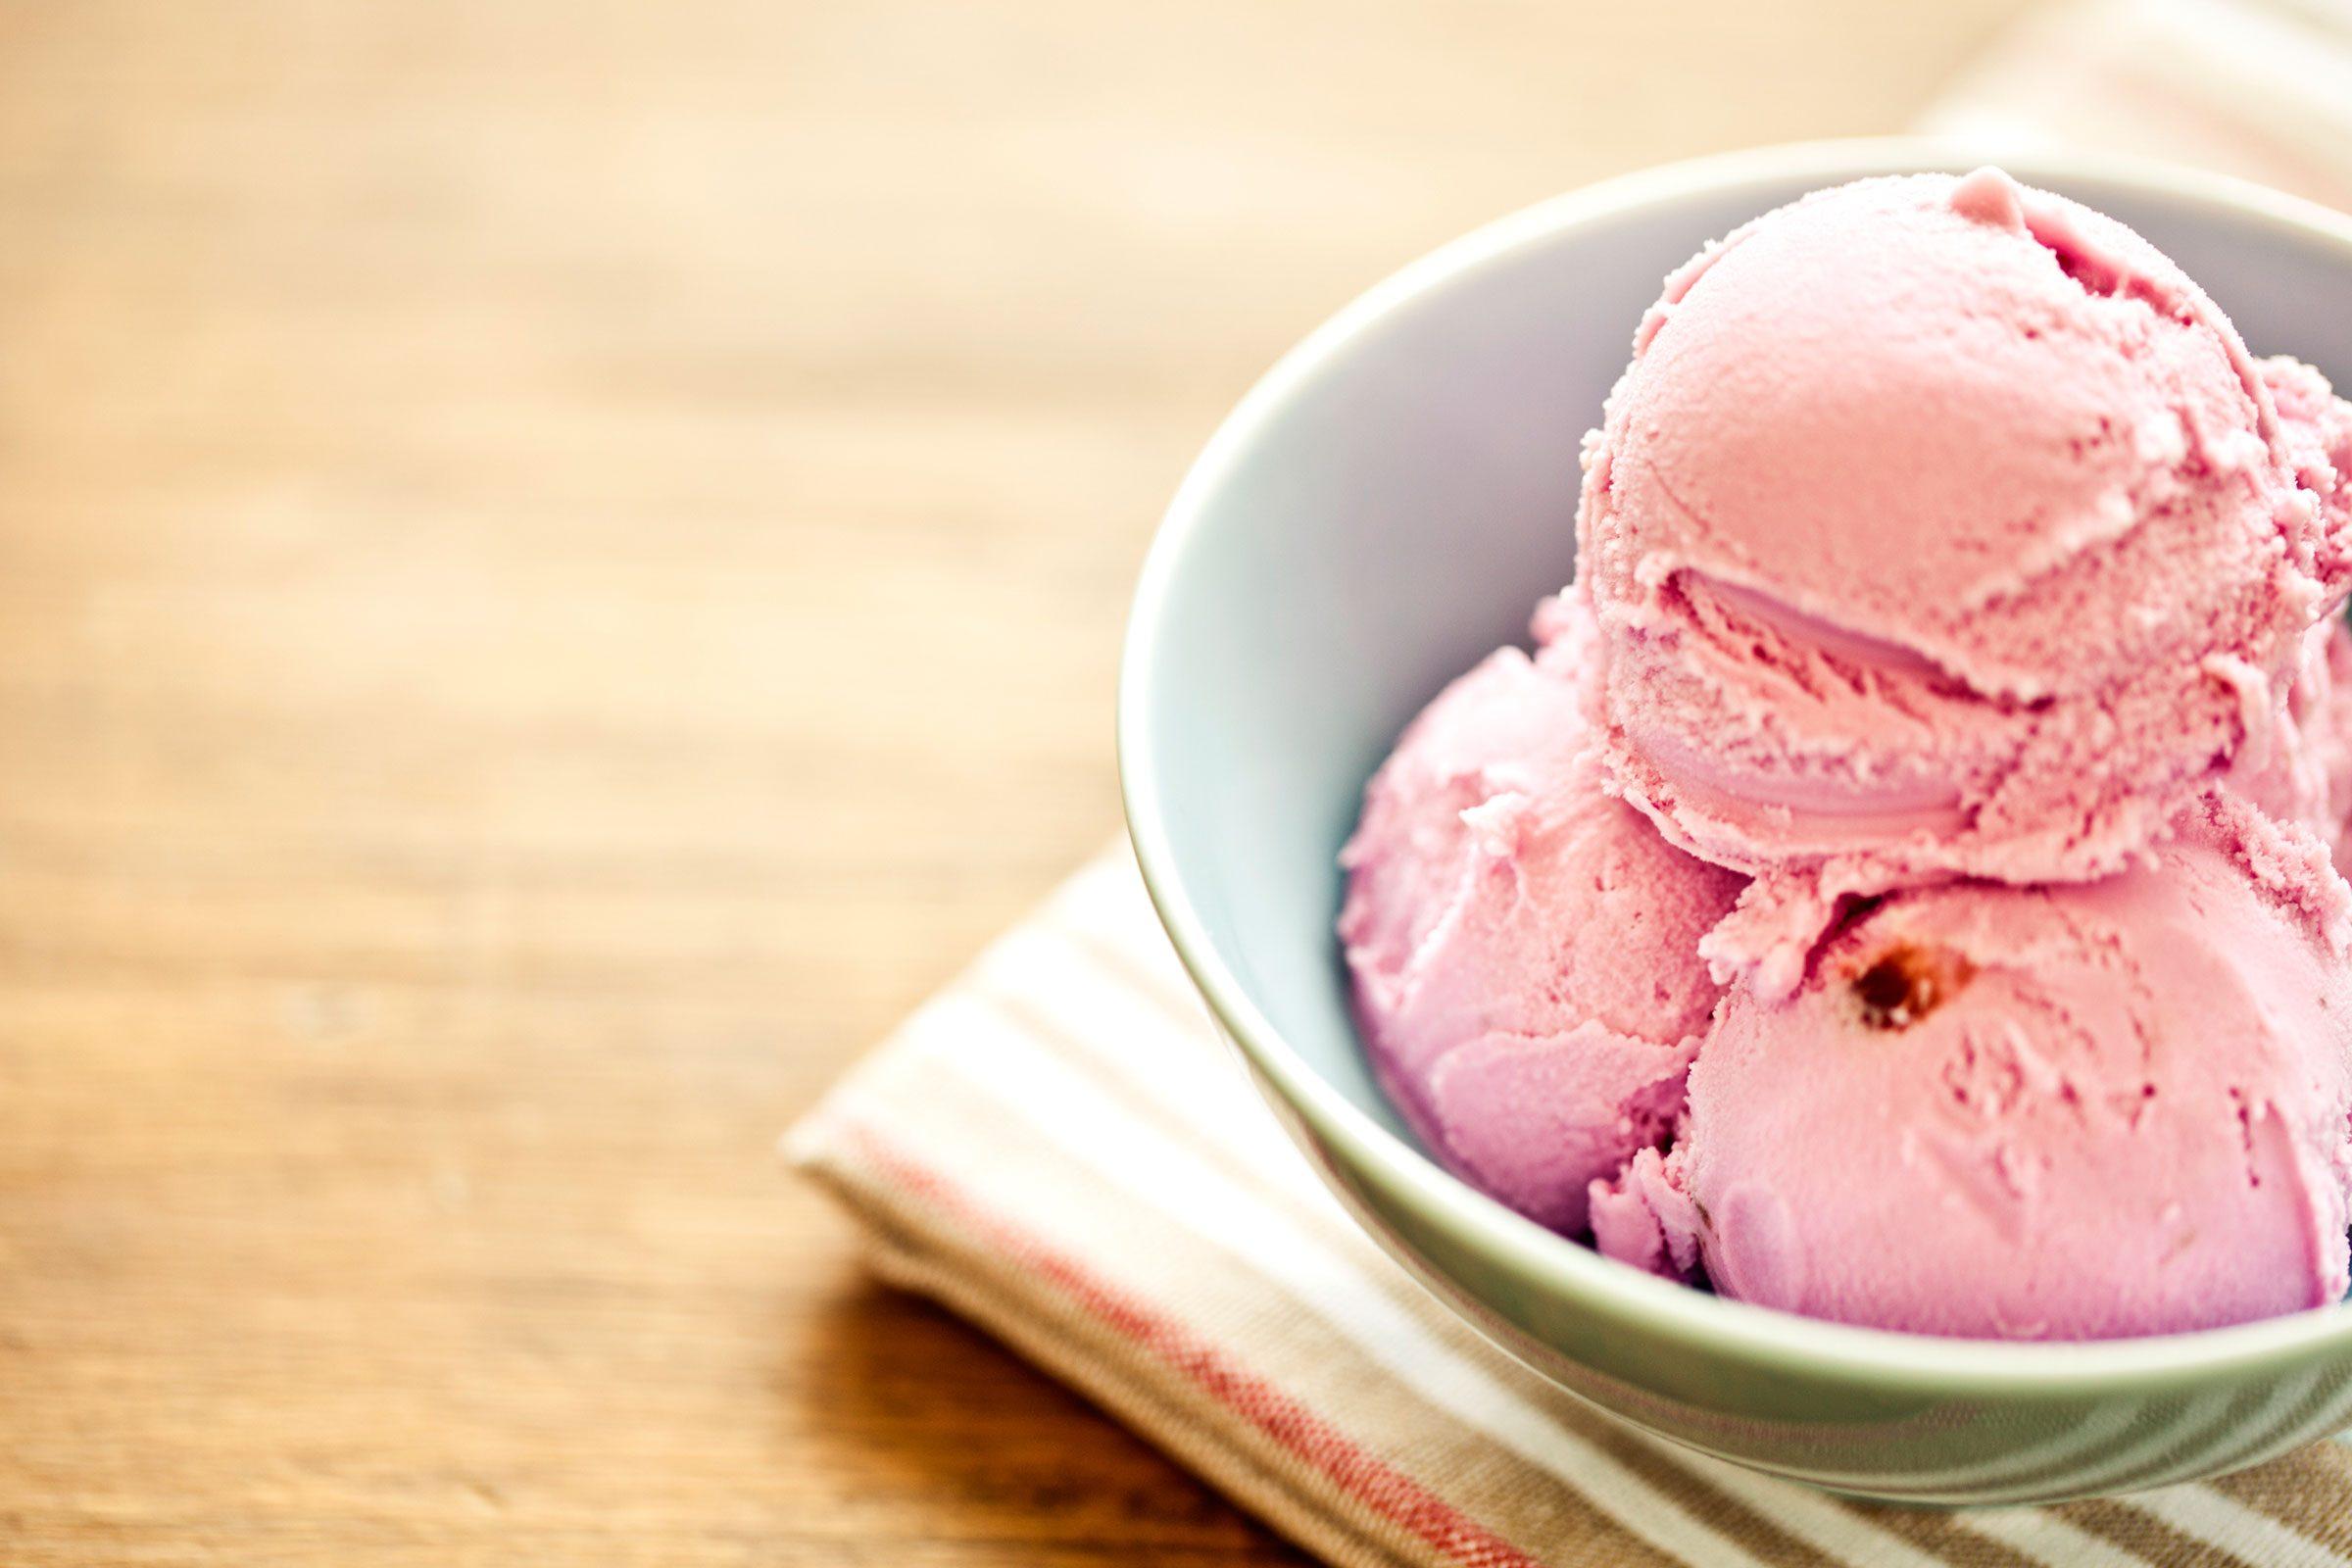 Soften ice cream hard as a brick